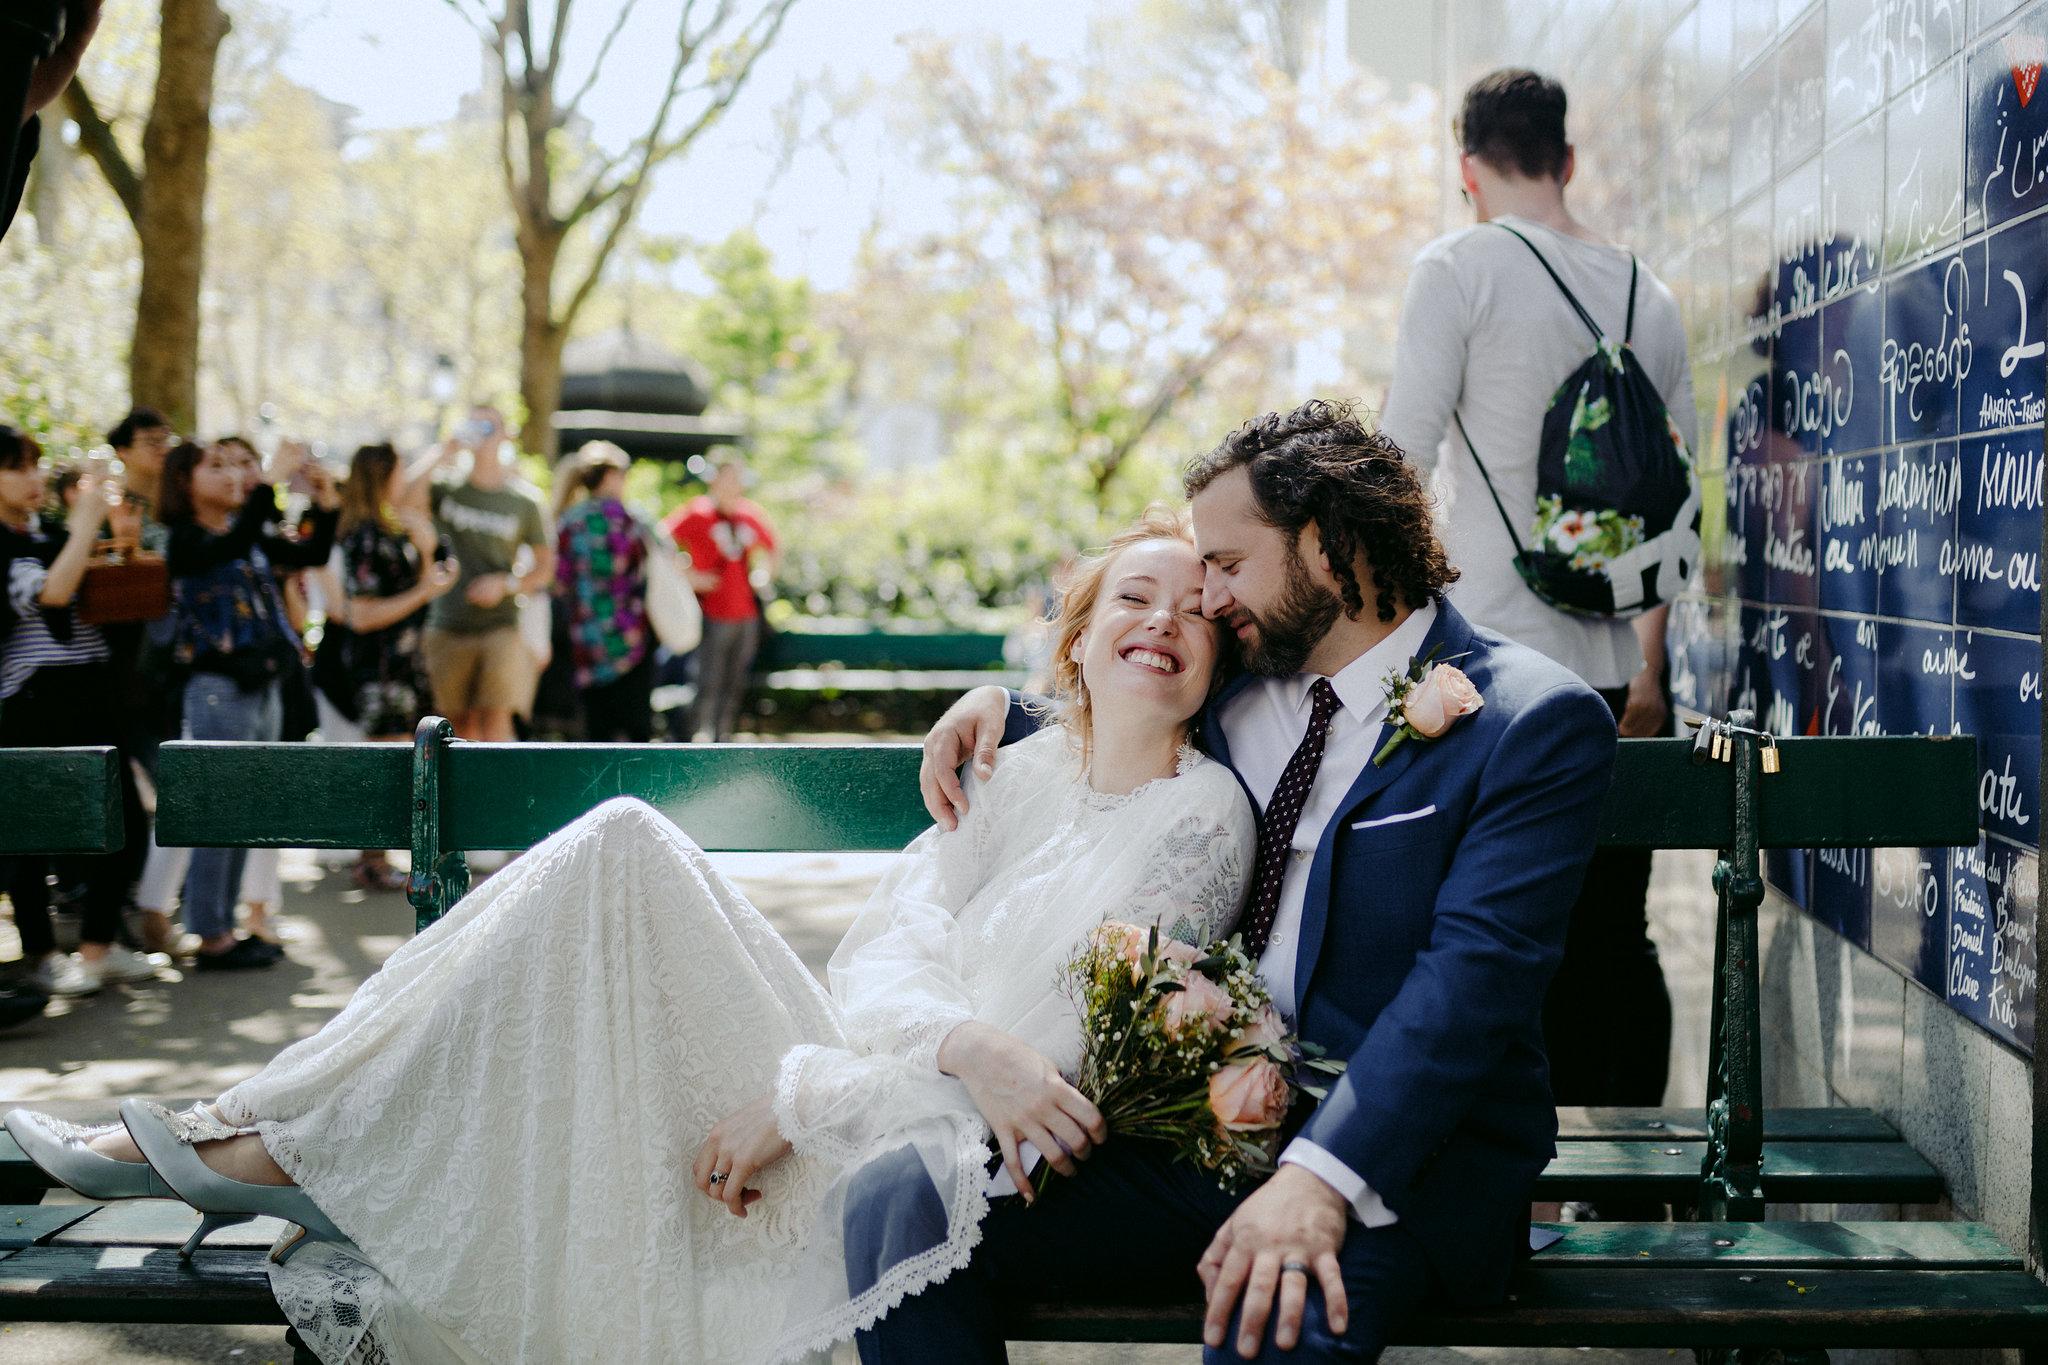 Paris_elopement_wedding_photographer-365.jpg